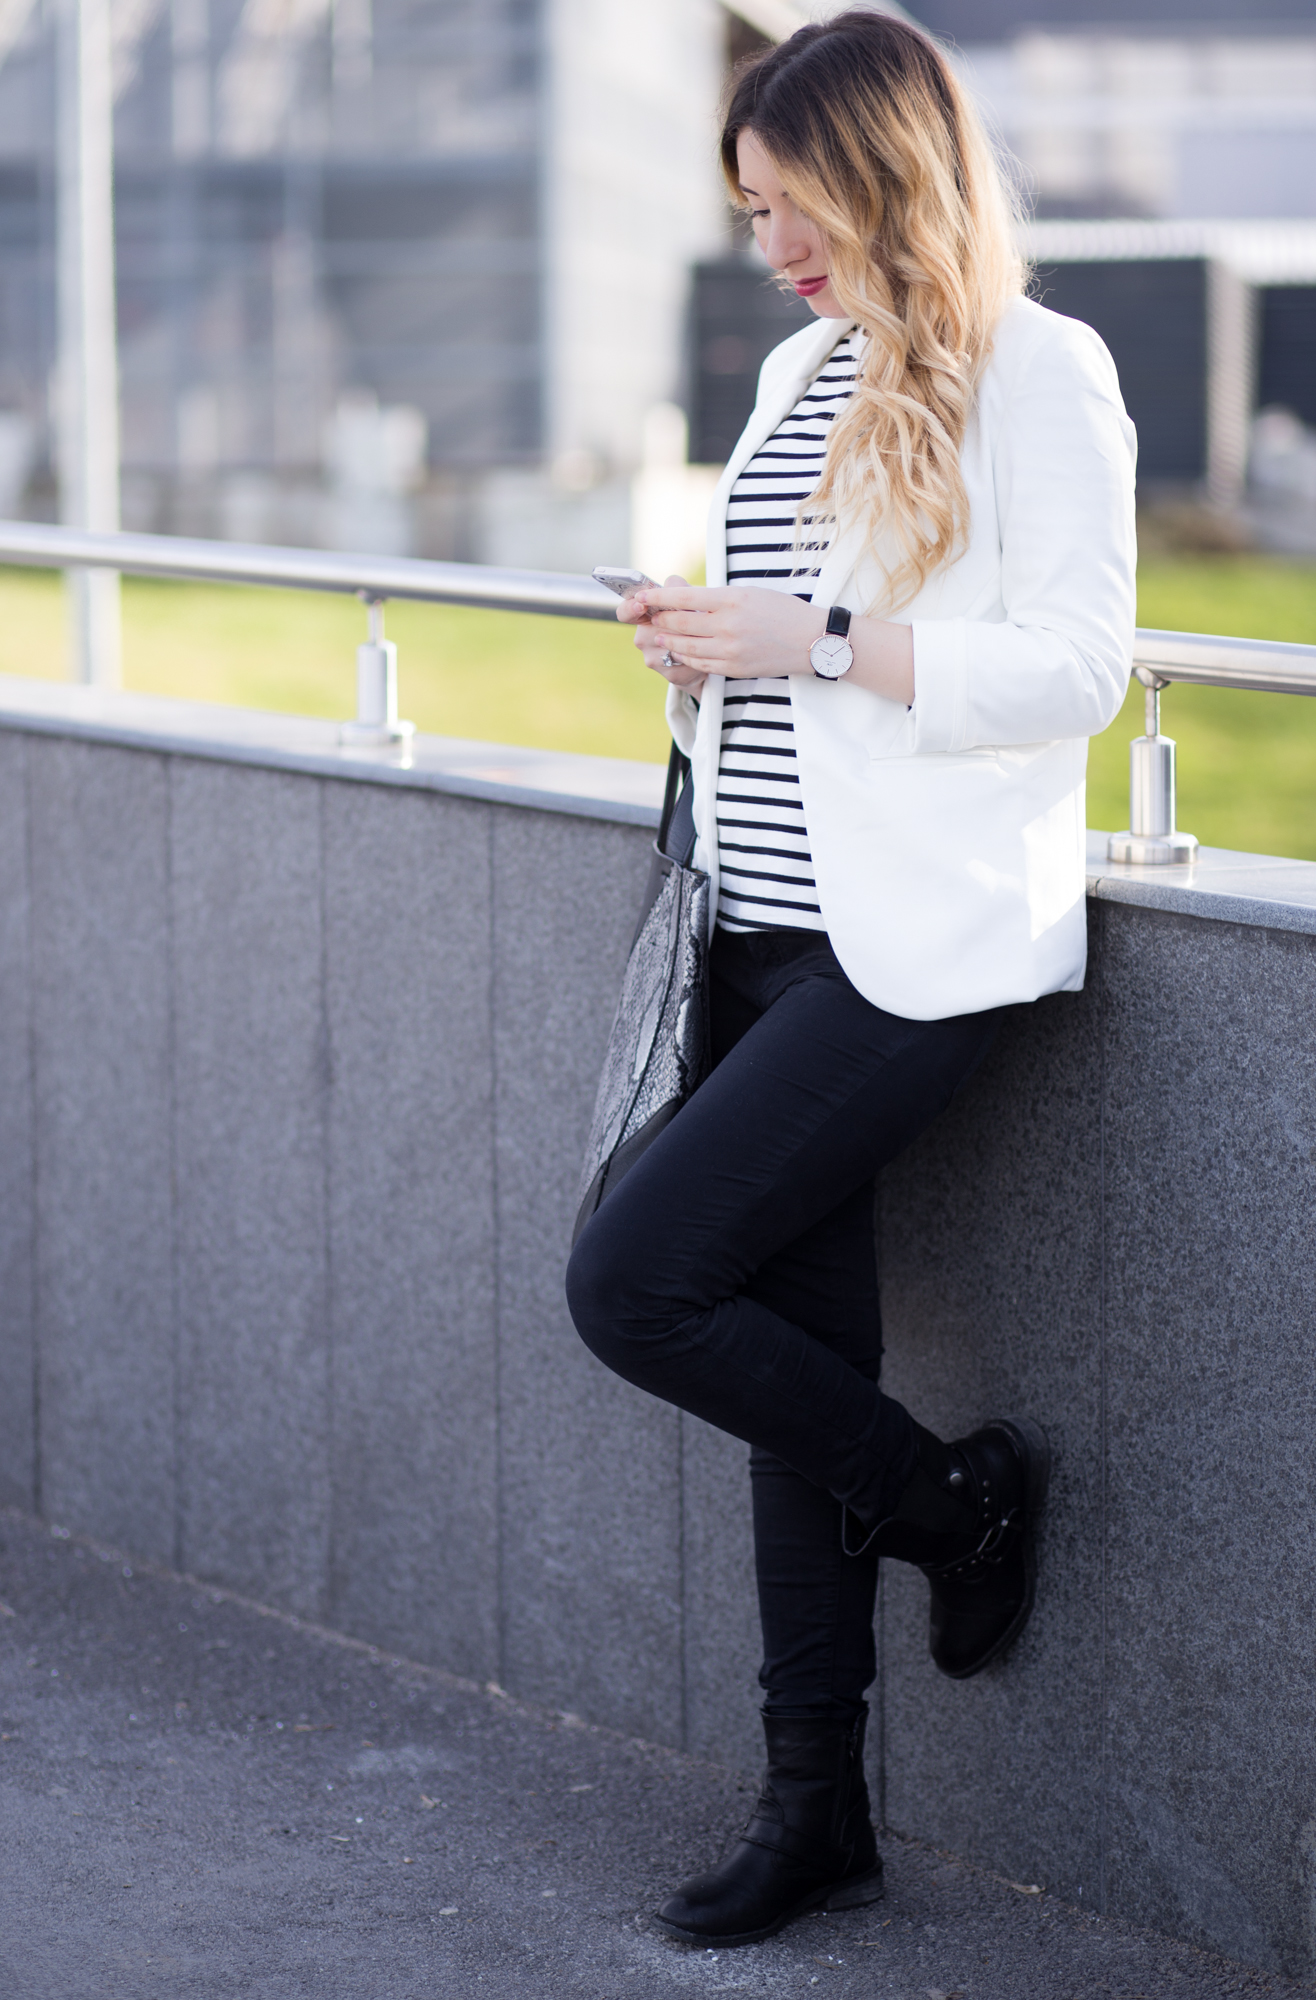 Andreea Ristea - tinuta de primavara alb si negru - fashion blogger Bucuresti